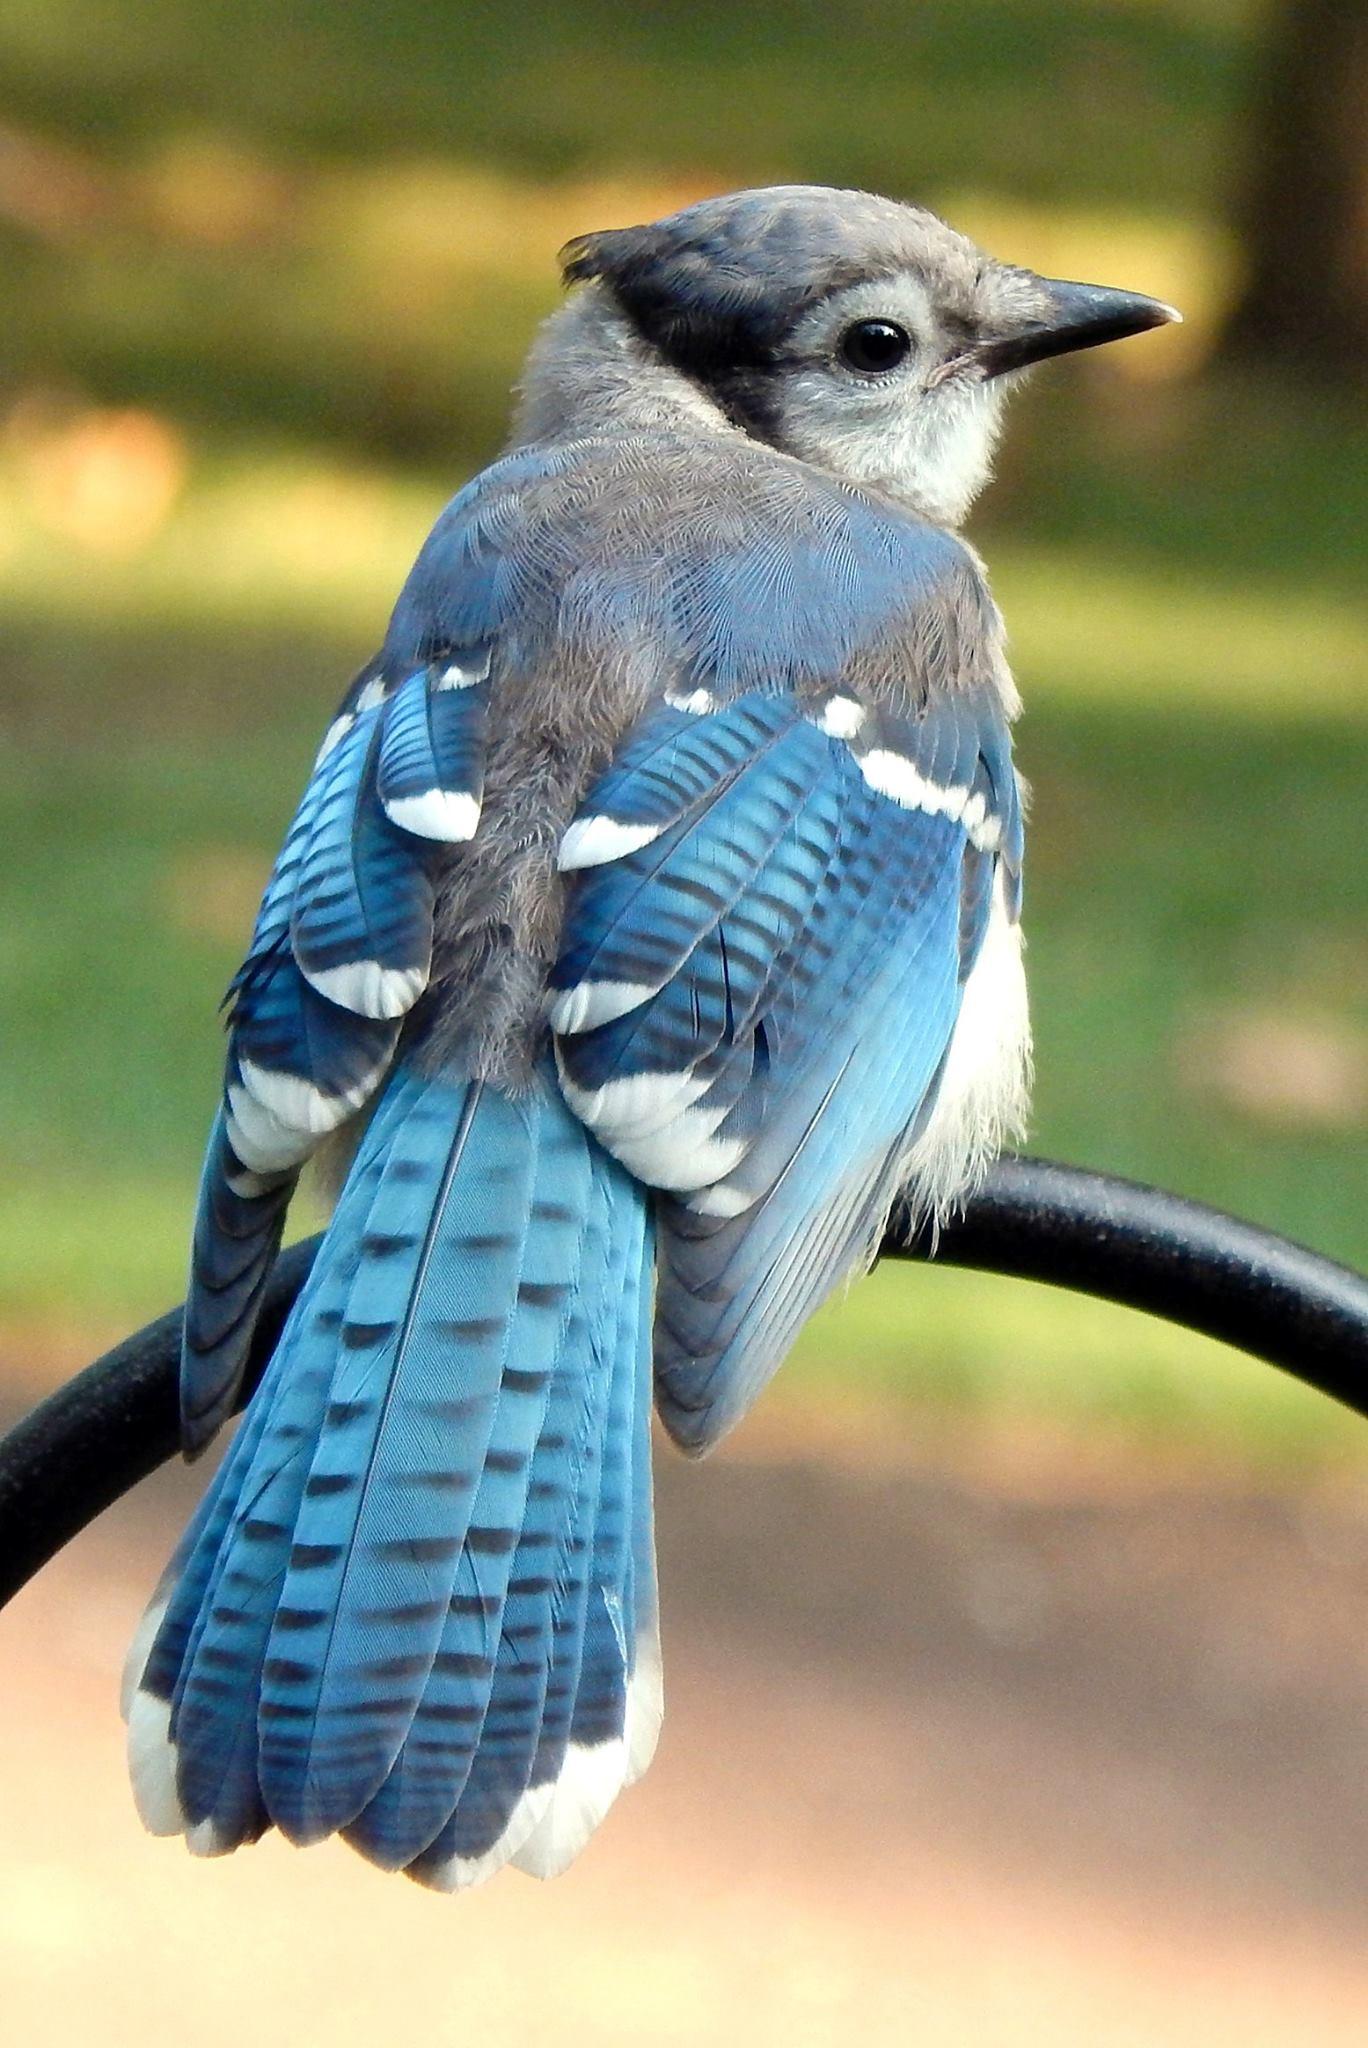 Juvenile Blue Jay - Photo by Maureen Mitchell